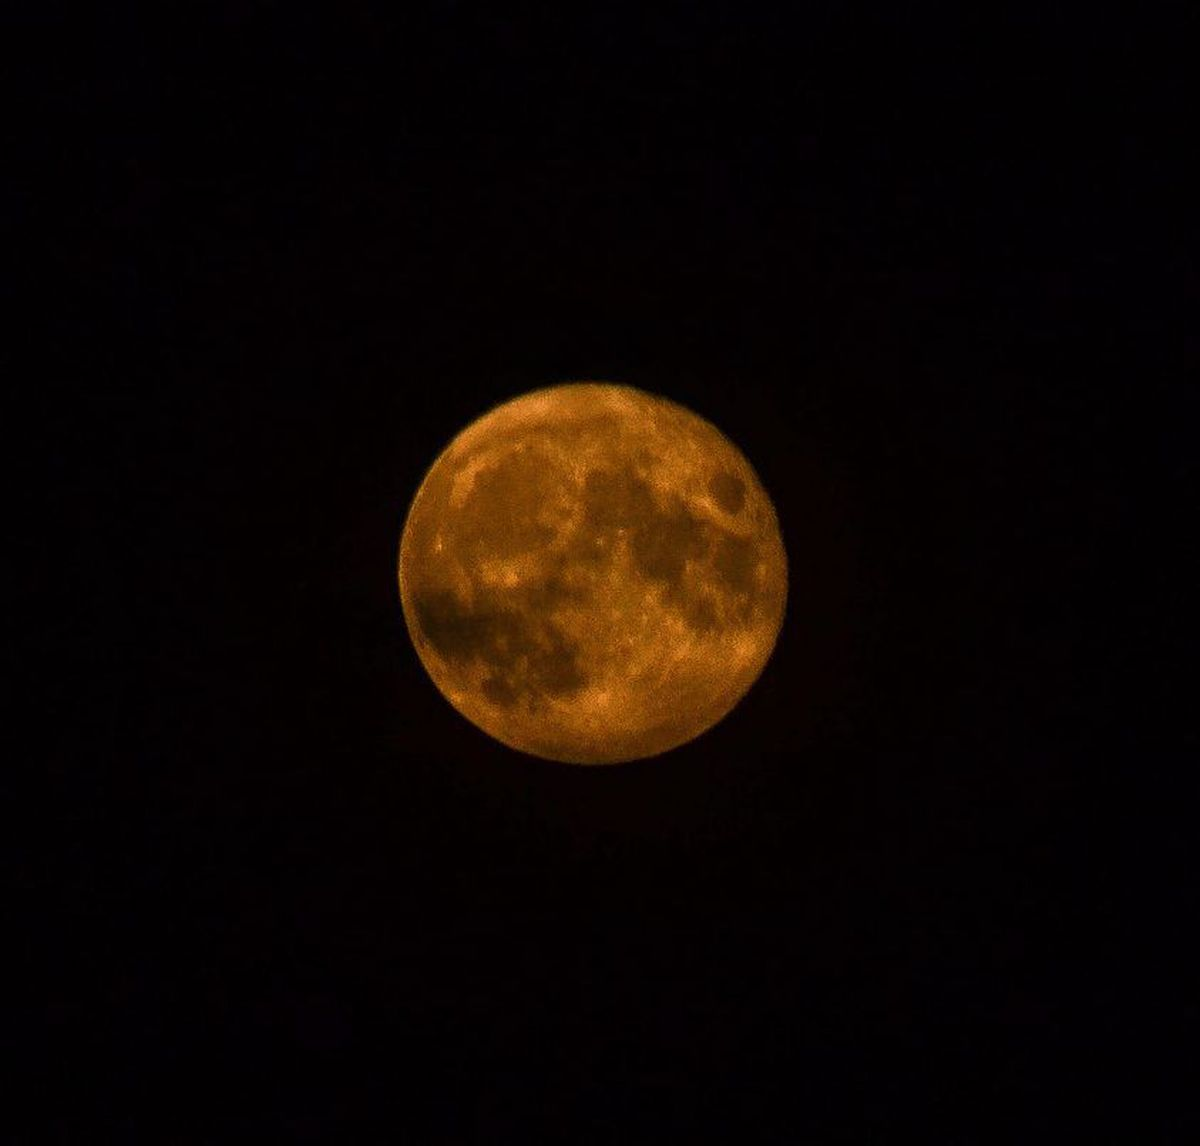 A shot of the Corn moon by Juanita Lloyd